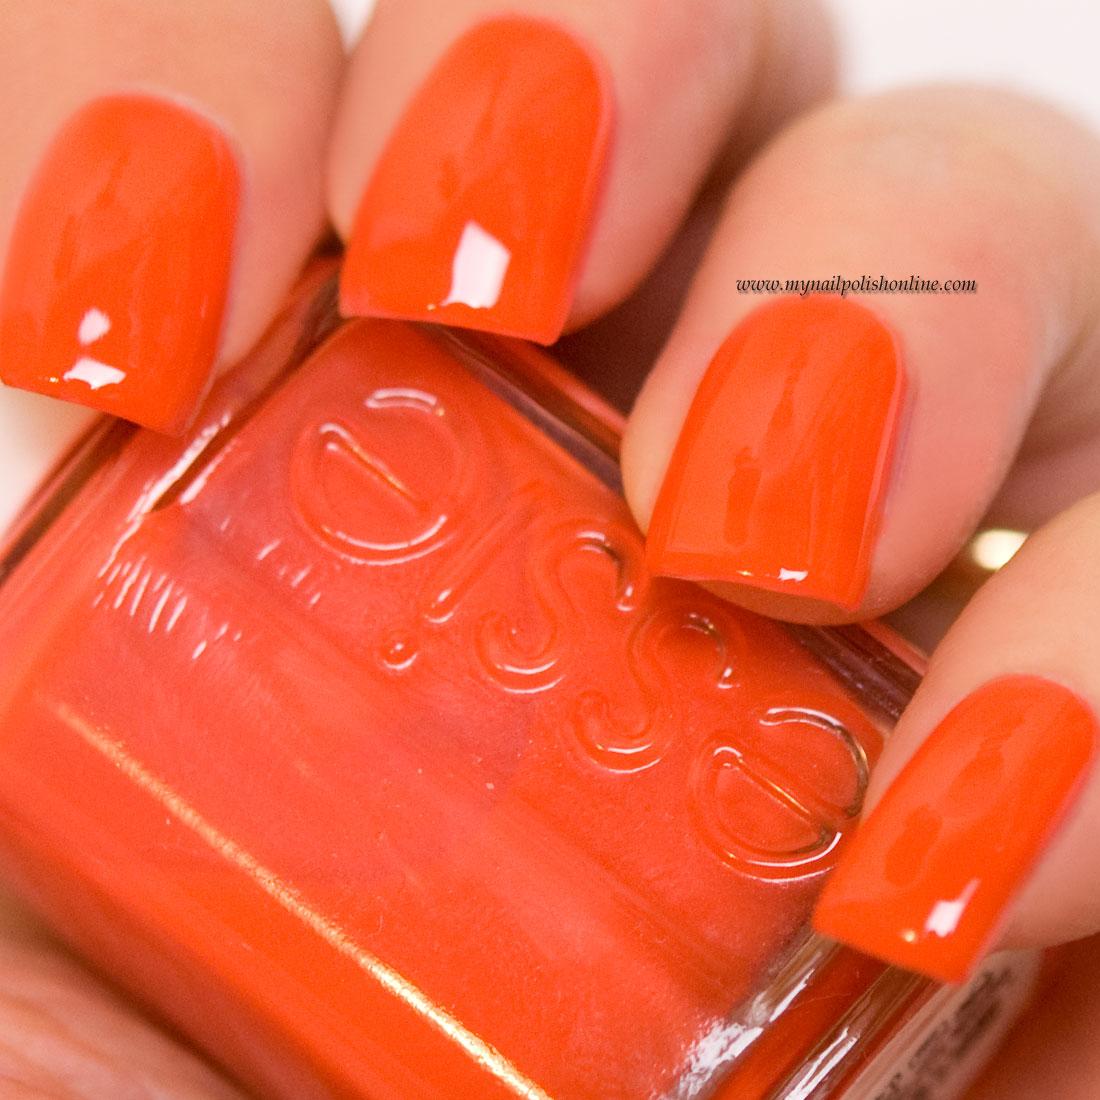 Essie - Bazooka - My Nail Polish Online